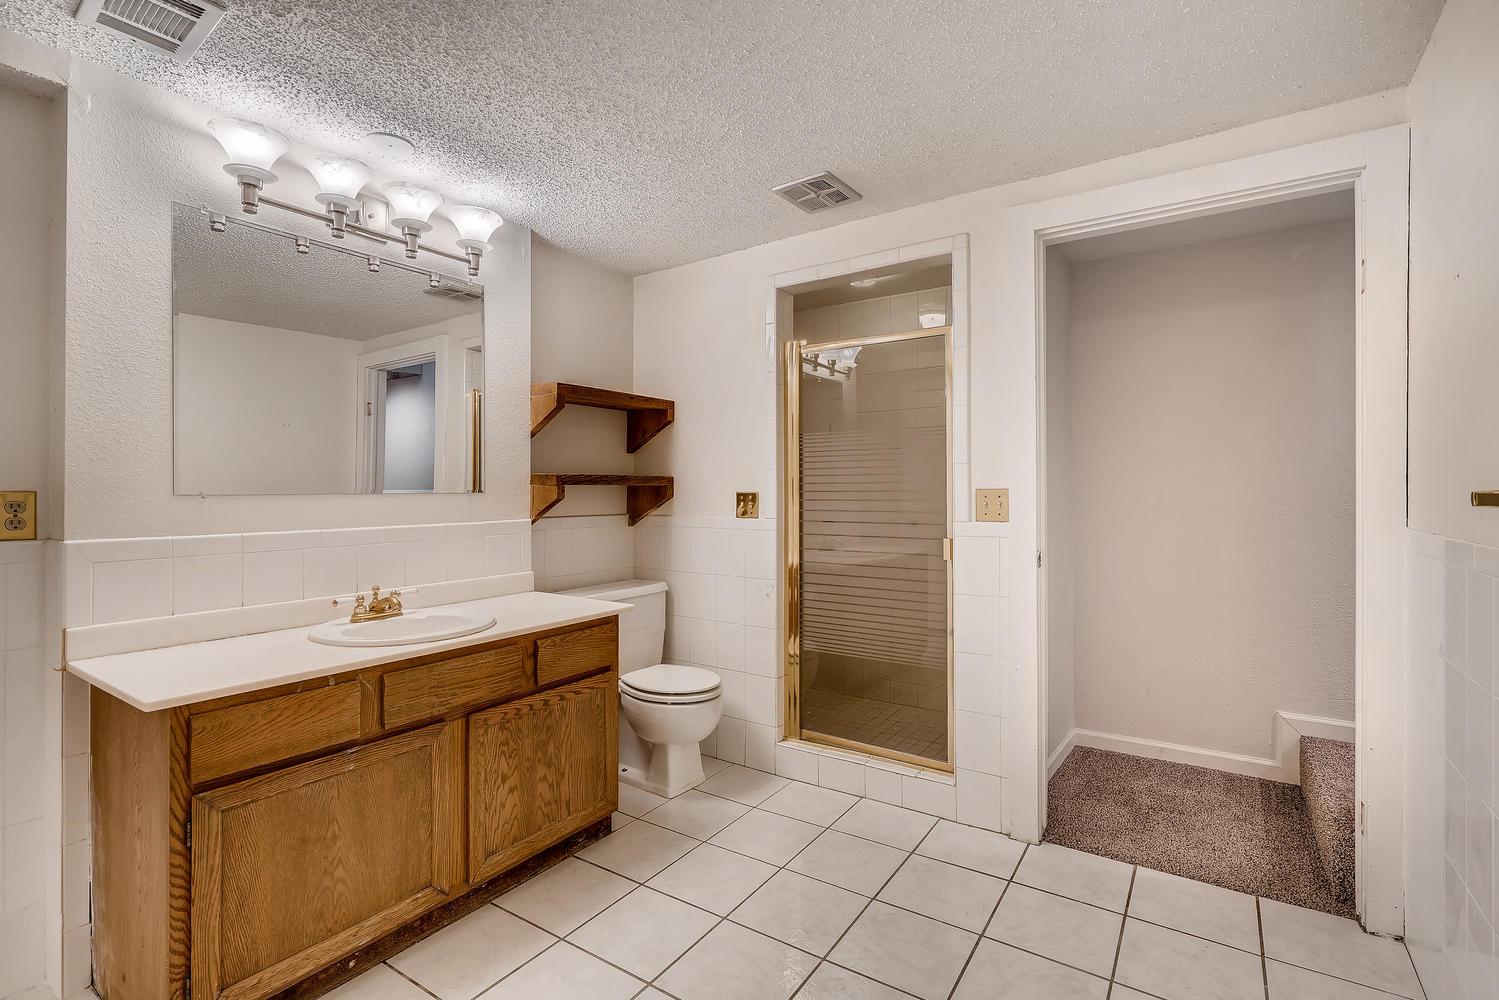 5439 S Morning Glory Lane-large-022-11-Lower Level Bathroom-1500x1000-72dpi.jpg